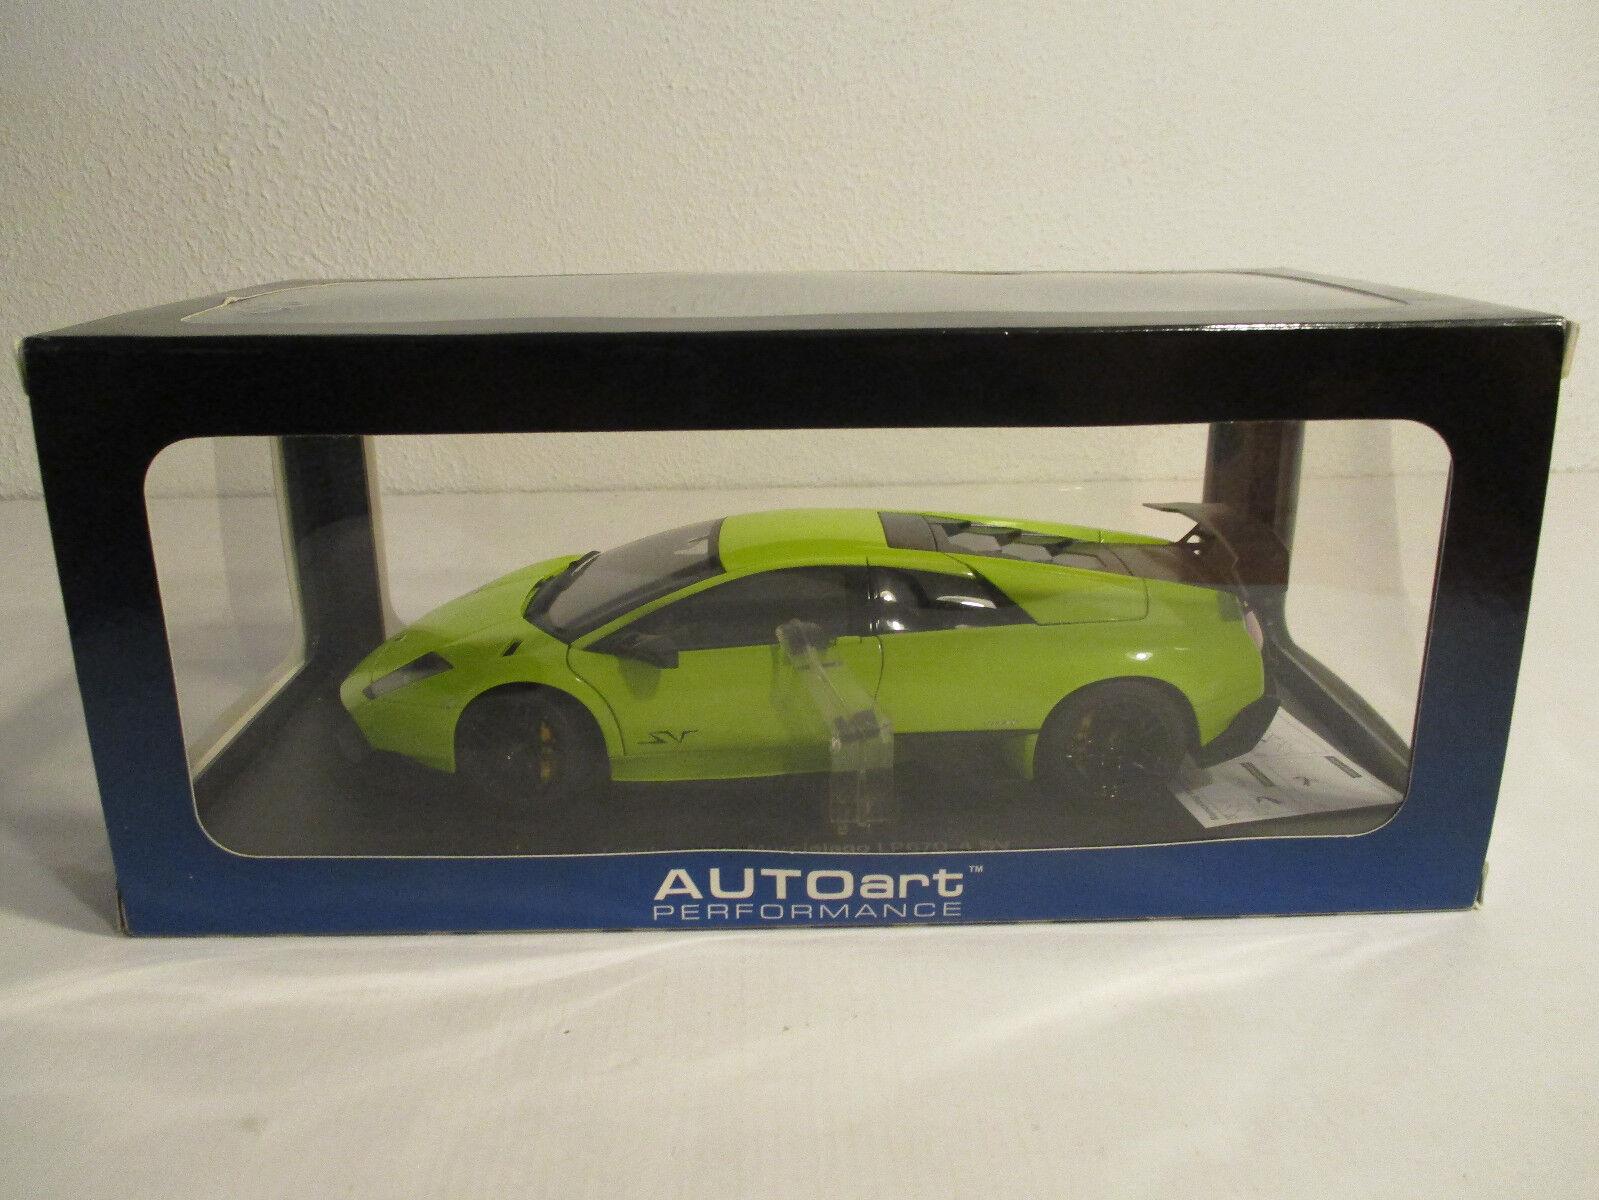 (Modelage) 1 18 Autoart Lamborghini Murcielago lp670-4 Sv vert SANDA L vert Nouveau neuf dans sa boîte